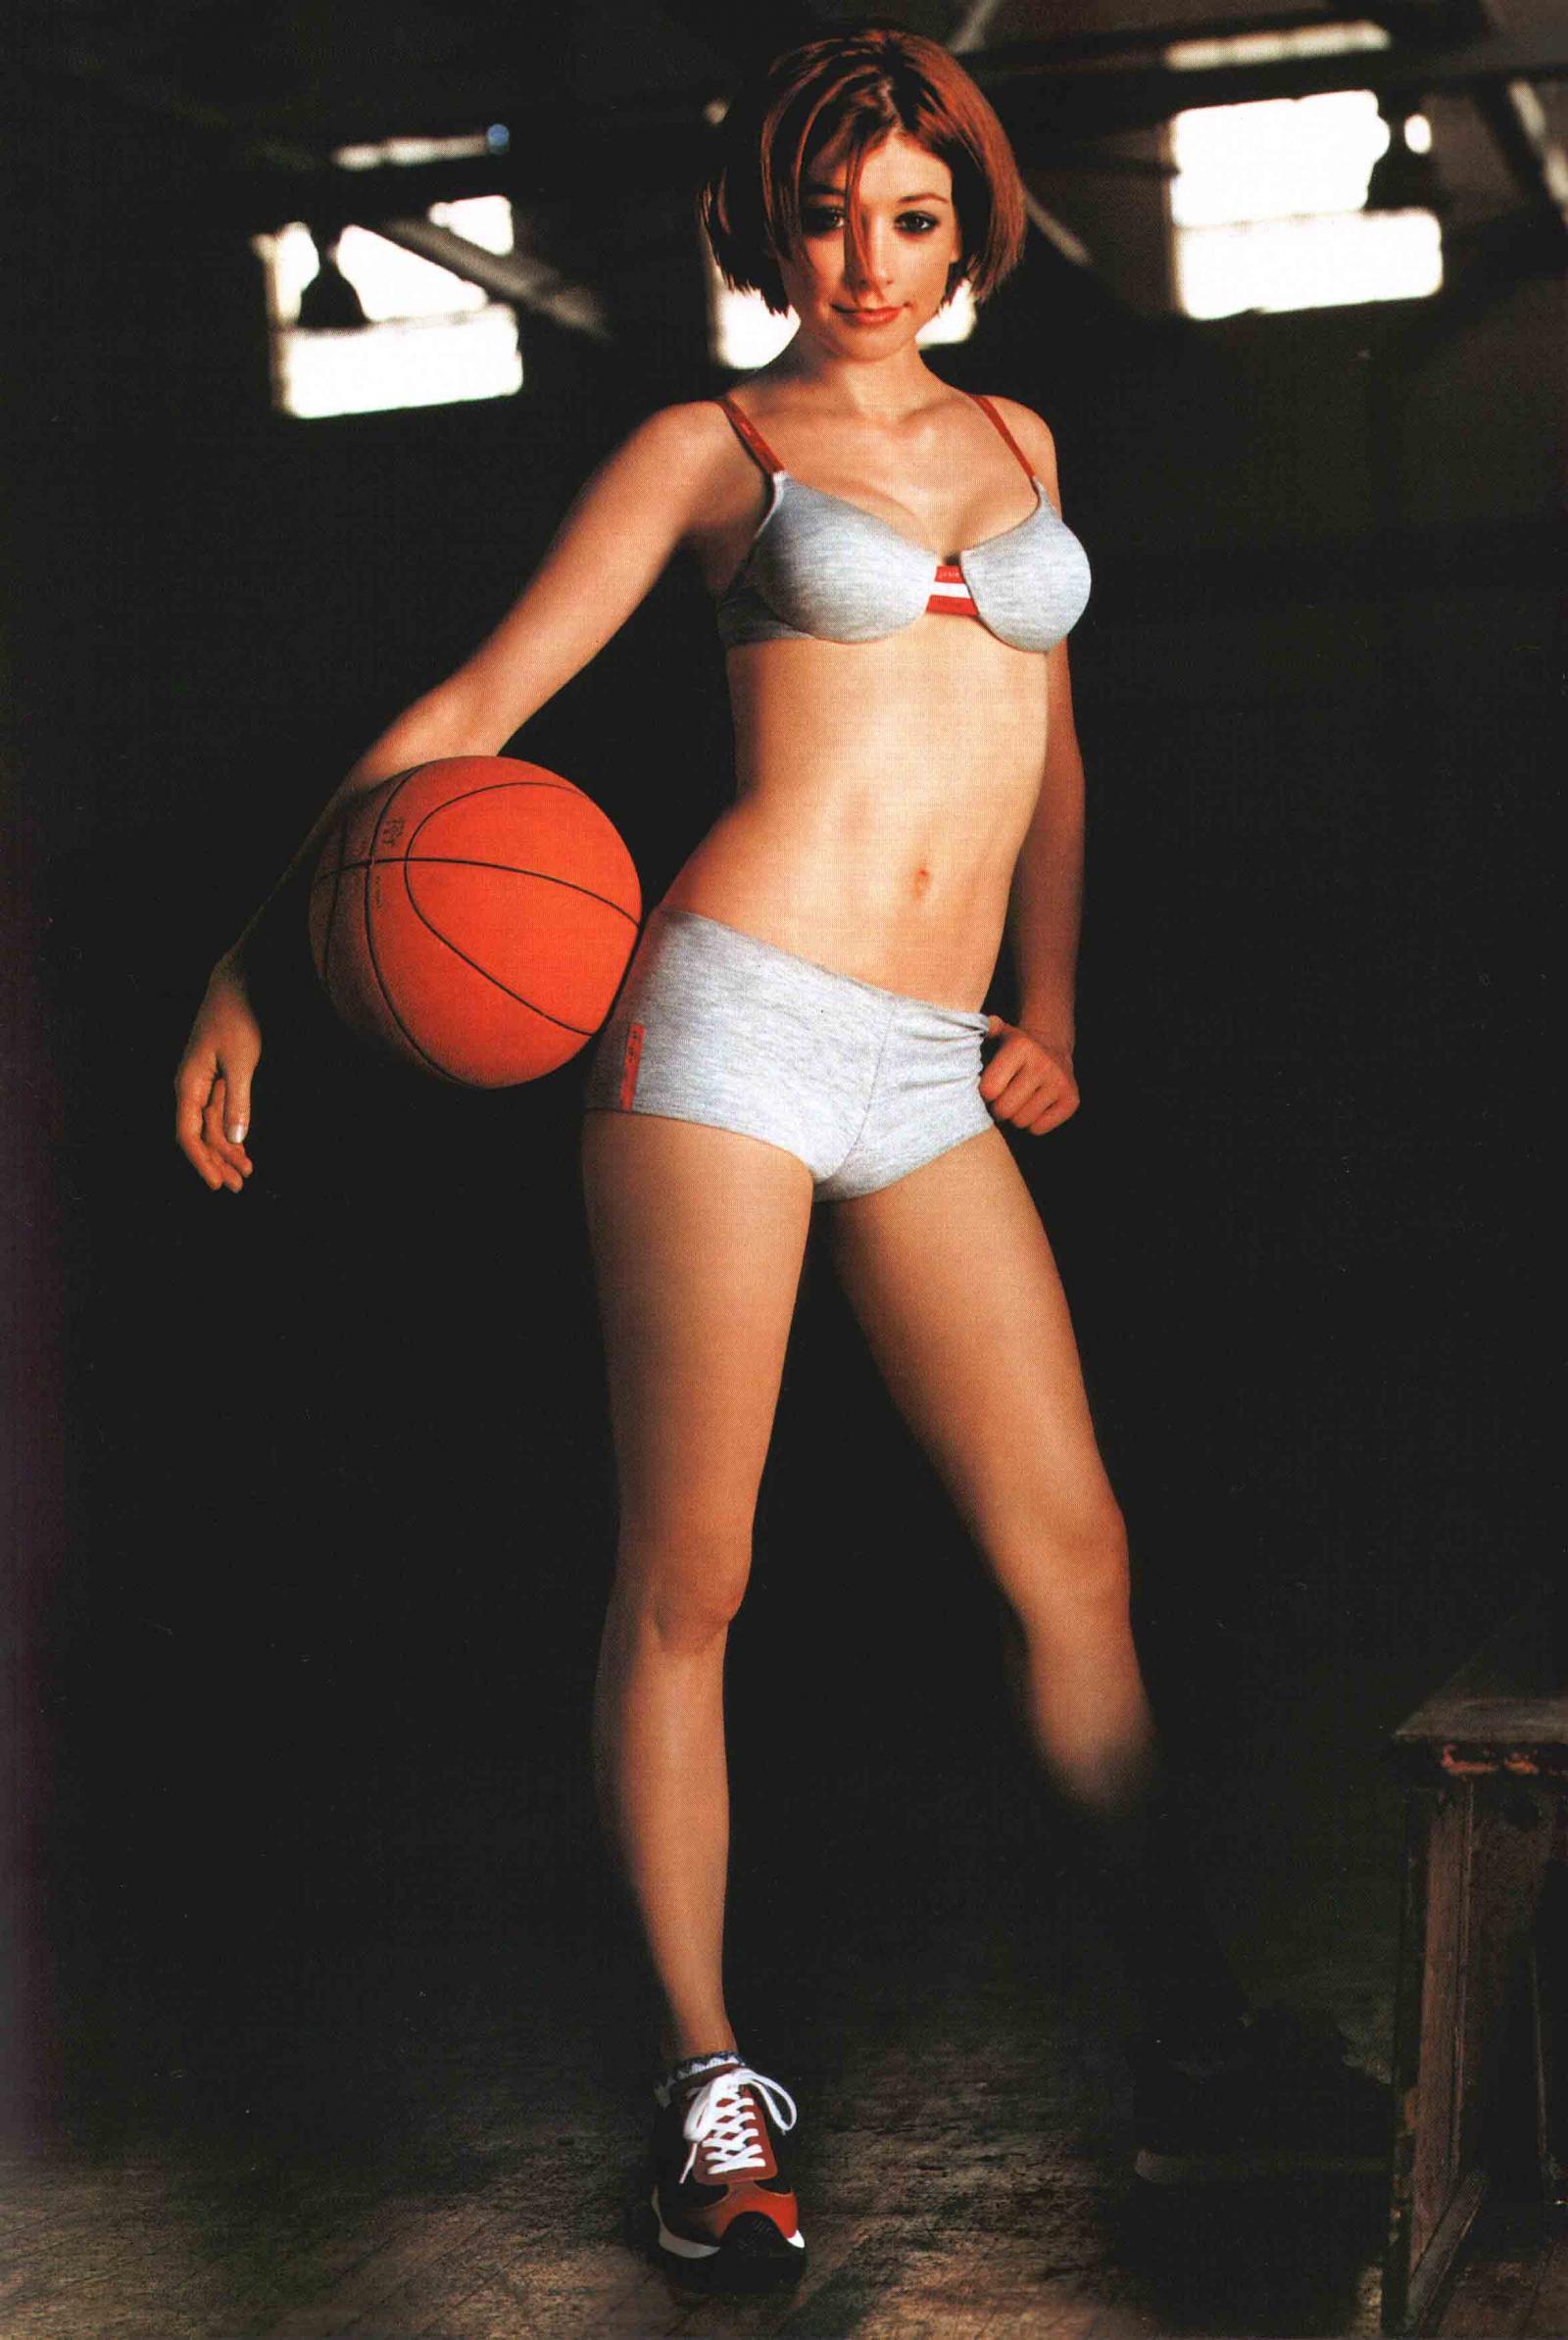 Wallpaper Alyson Hannigan basket ball